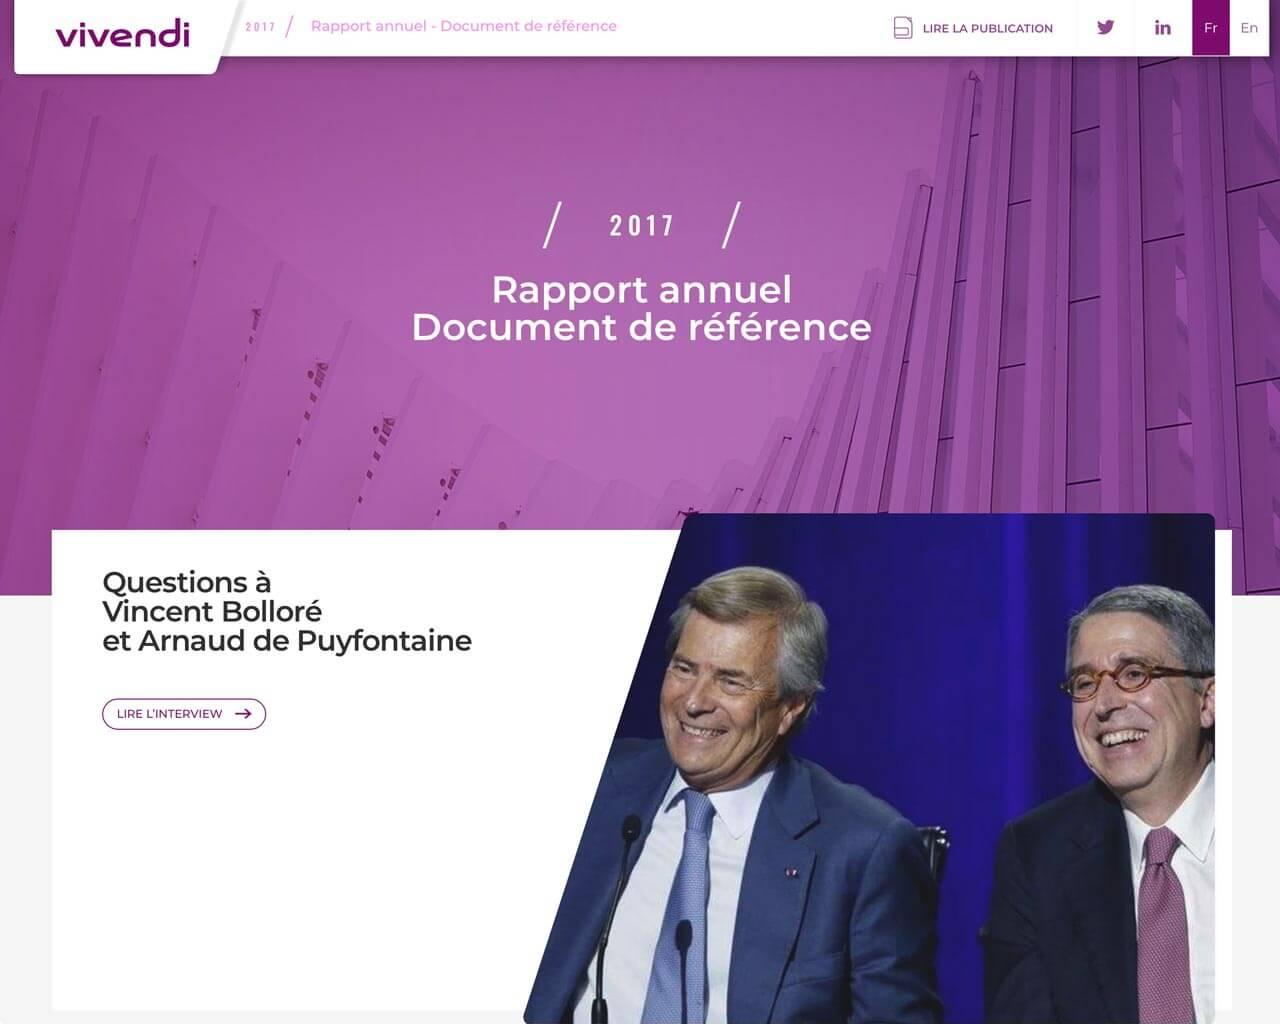 Vivendi / voir